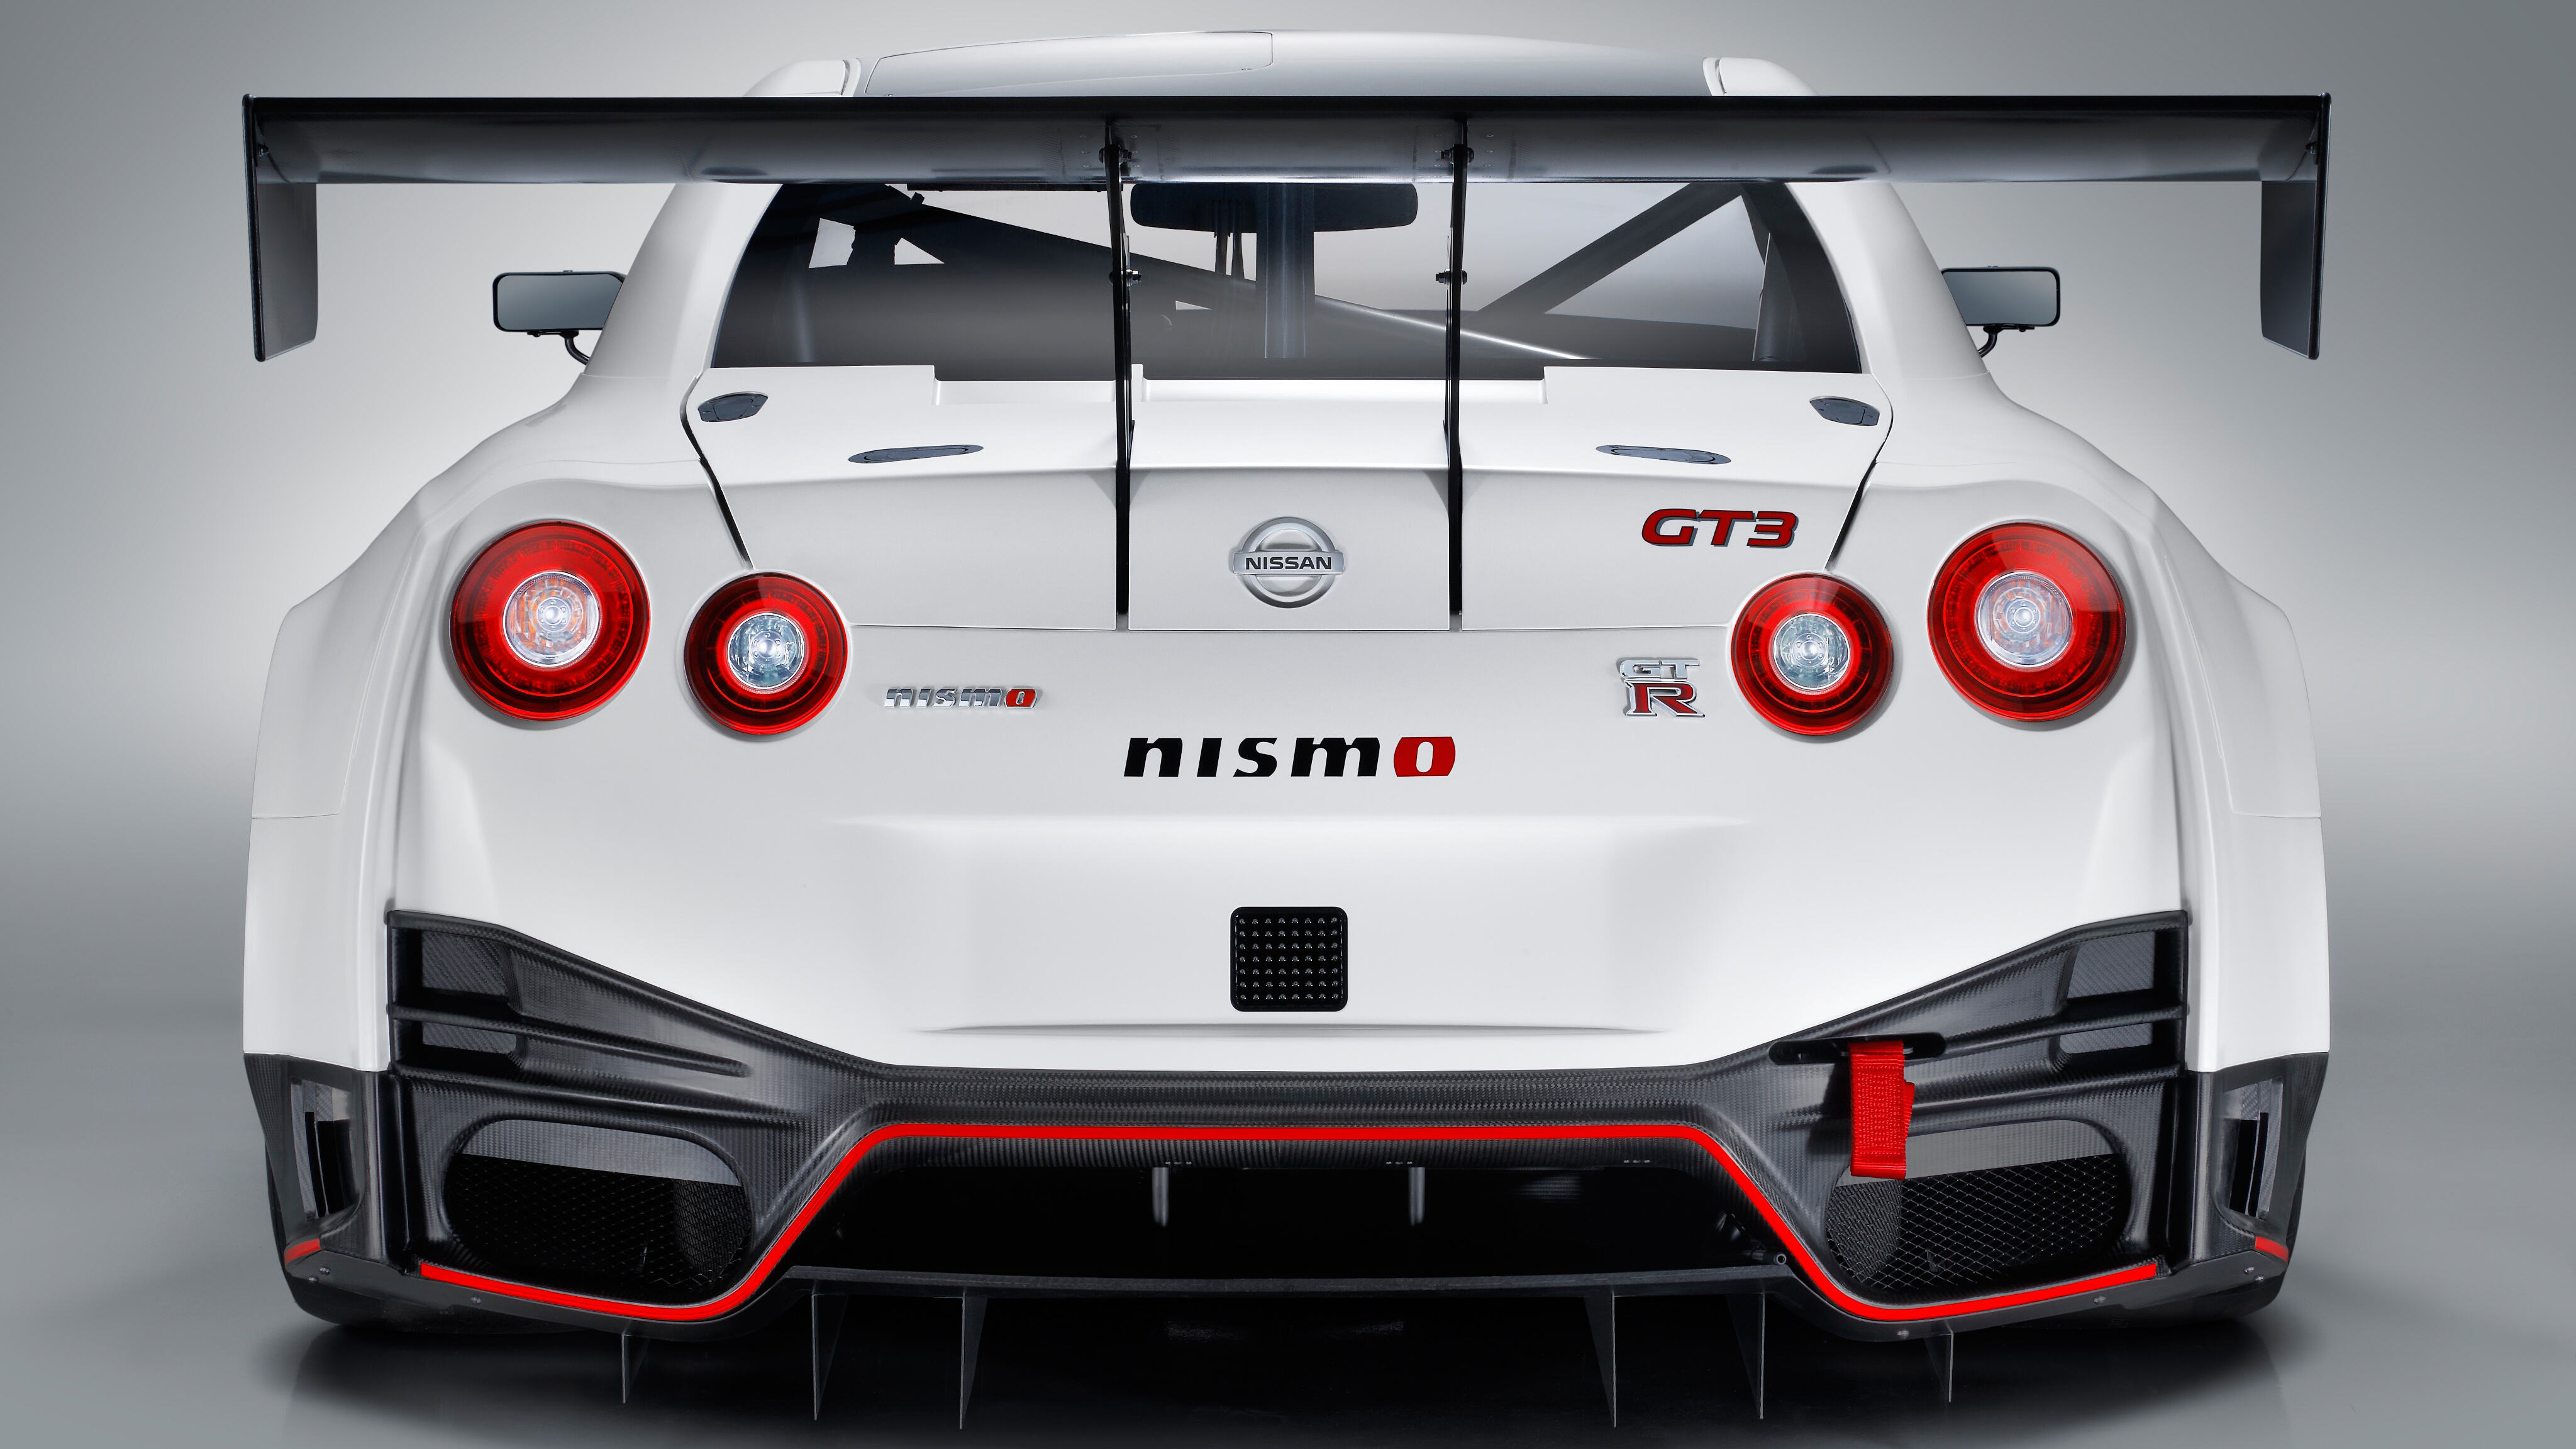 Nismo Nissan GT-R GT3 2018 4K Wallpaper | HD Car ...